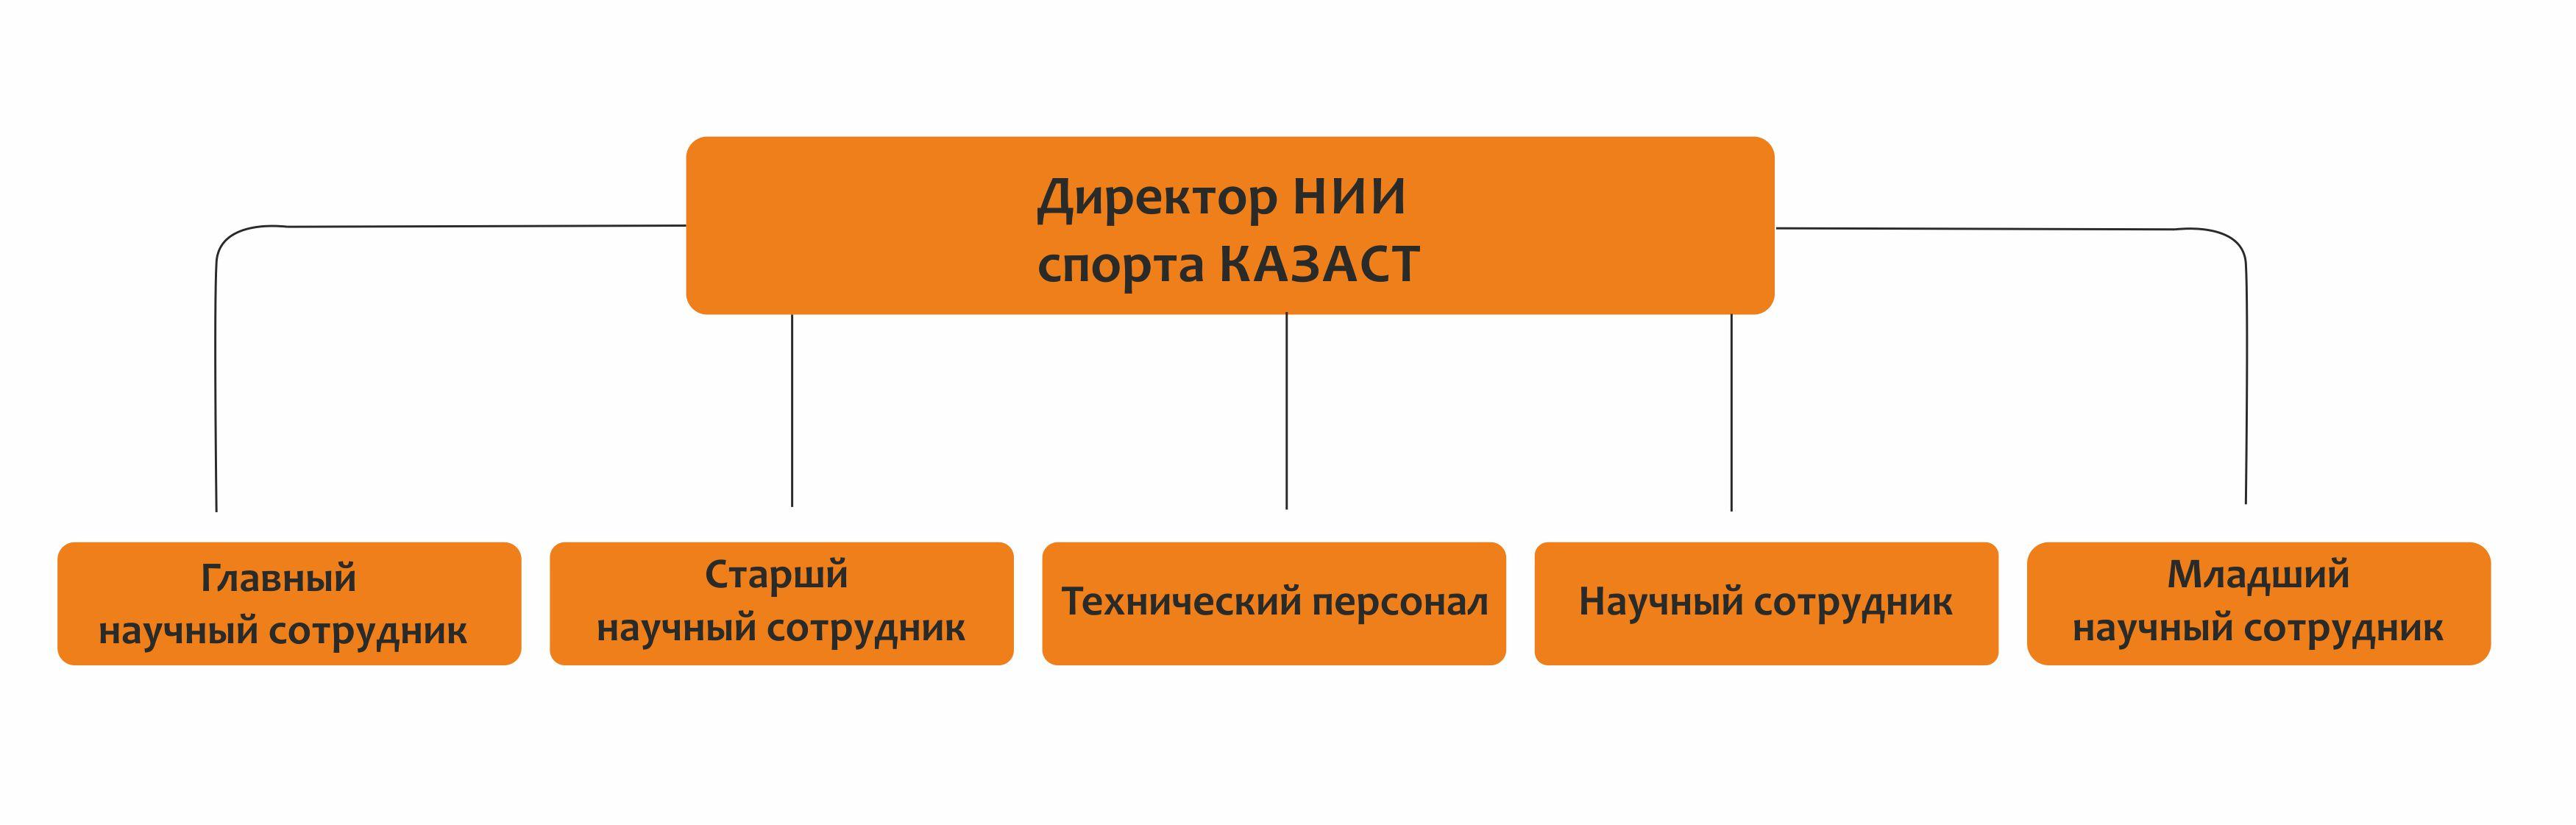 таблица нии